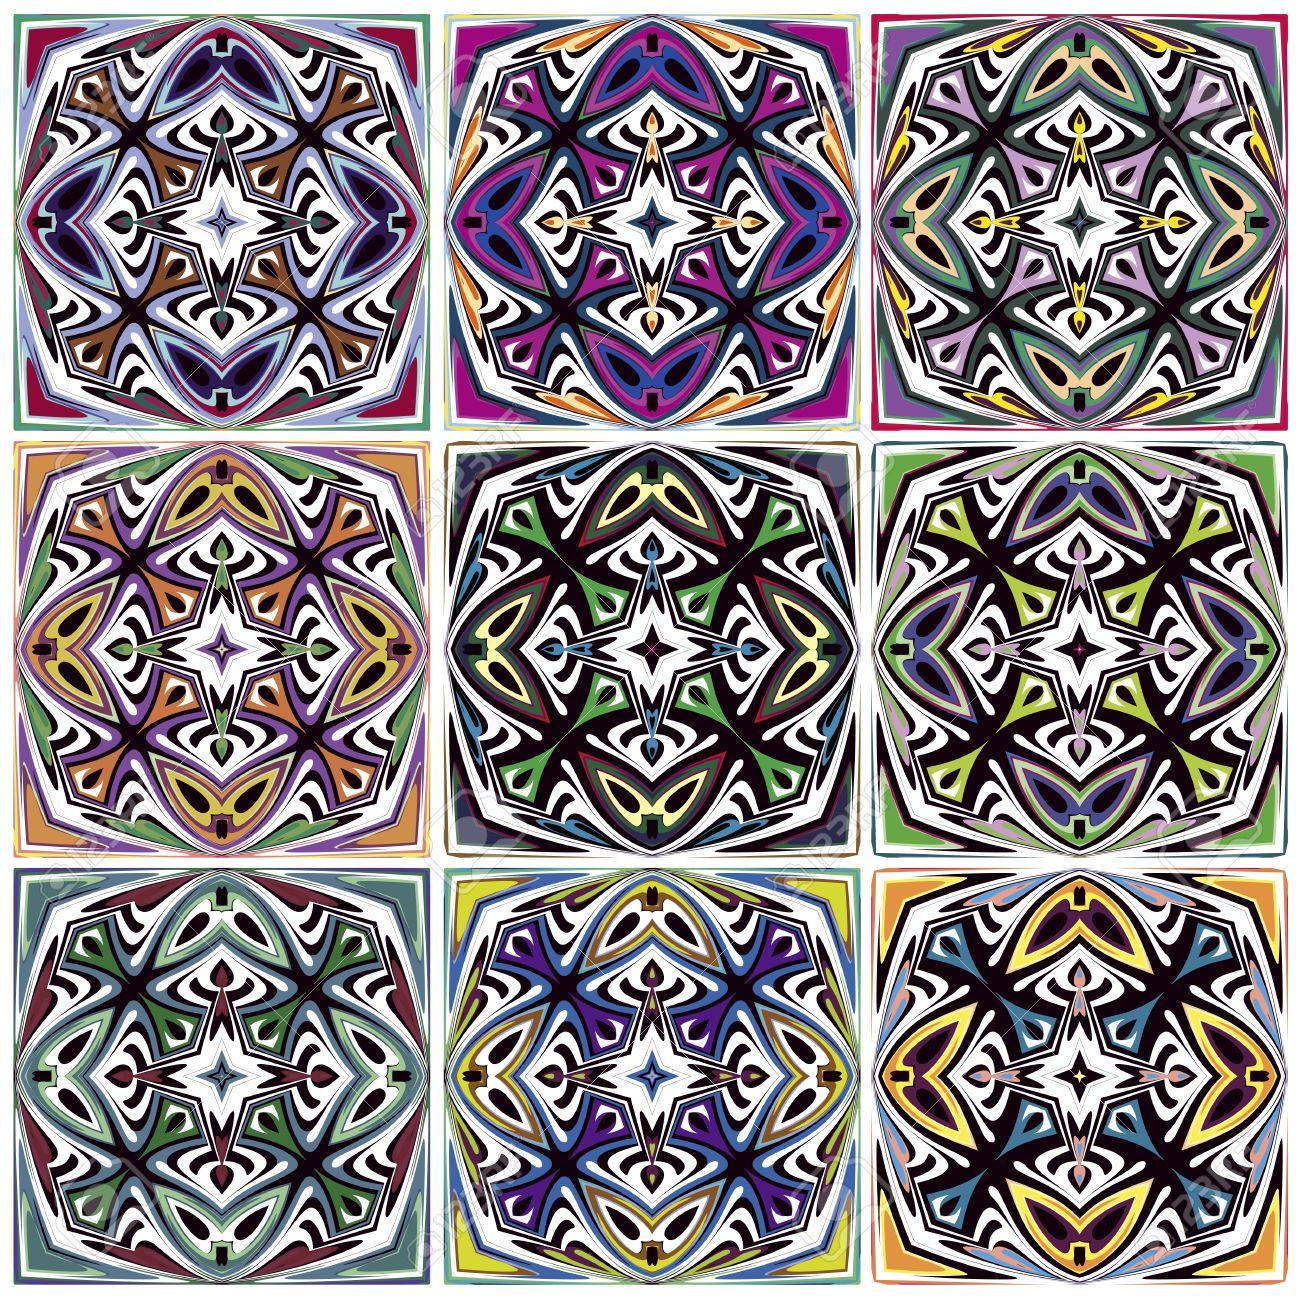 Set Of Seamless Native American Patterns With Spiritual Symbols